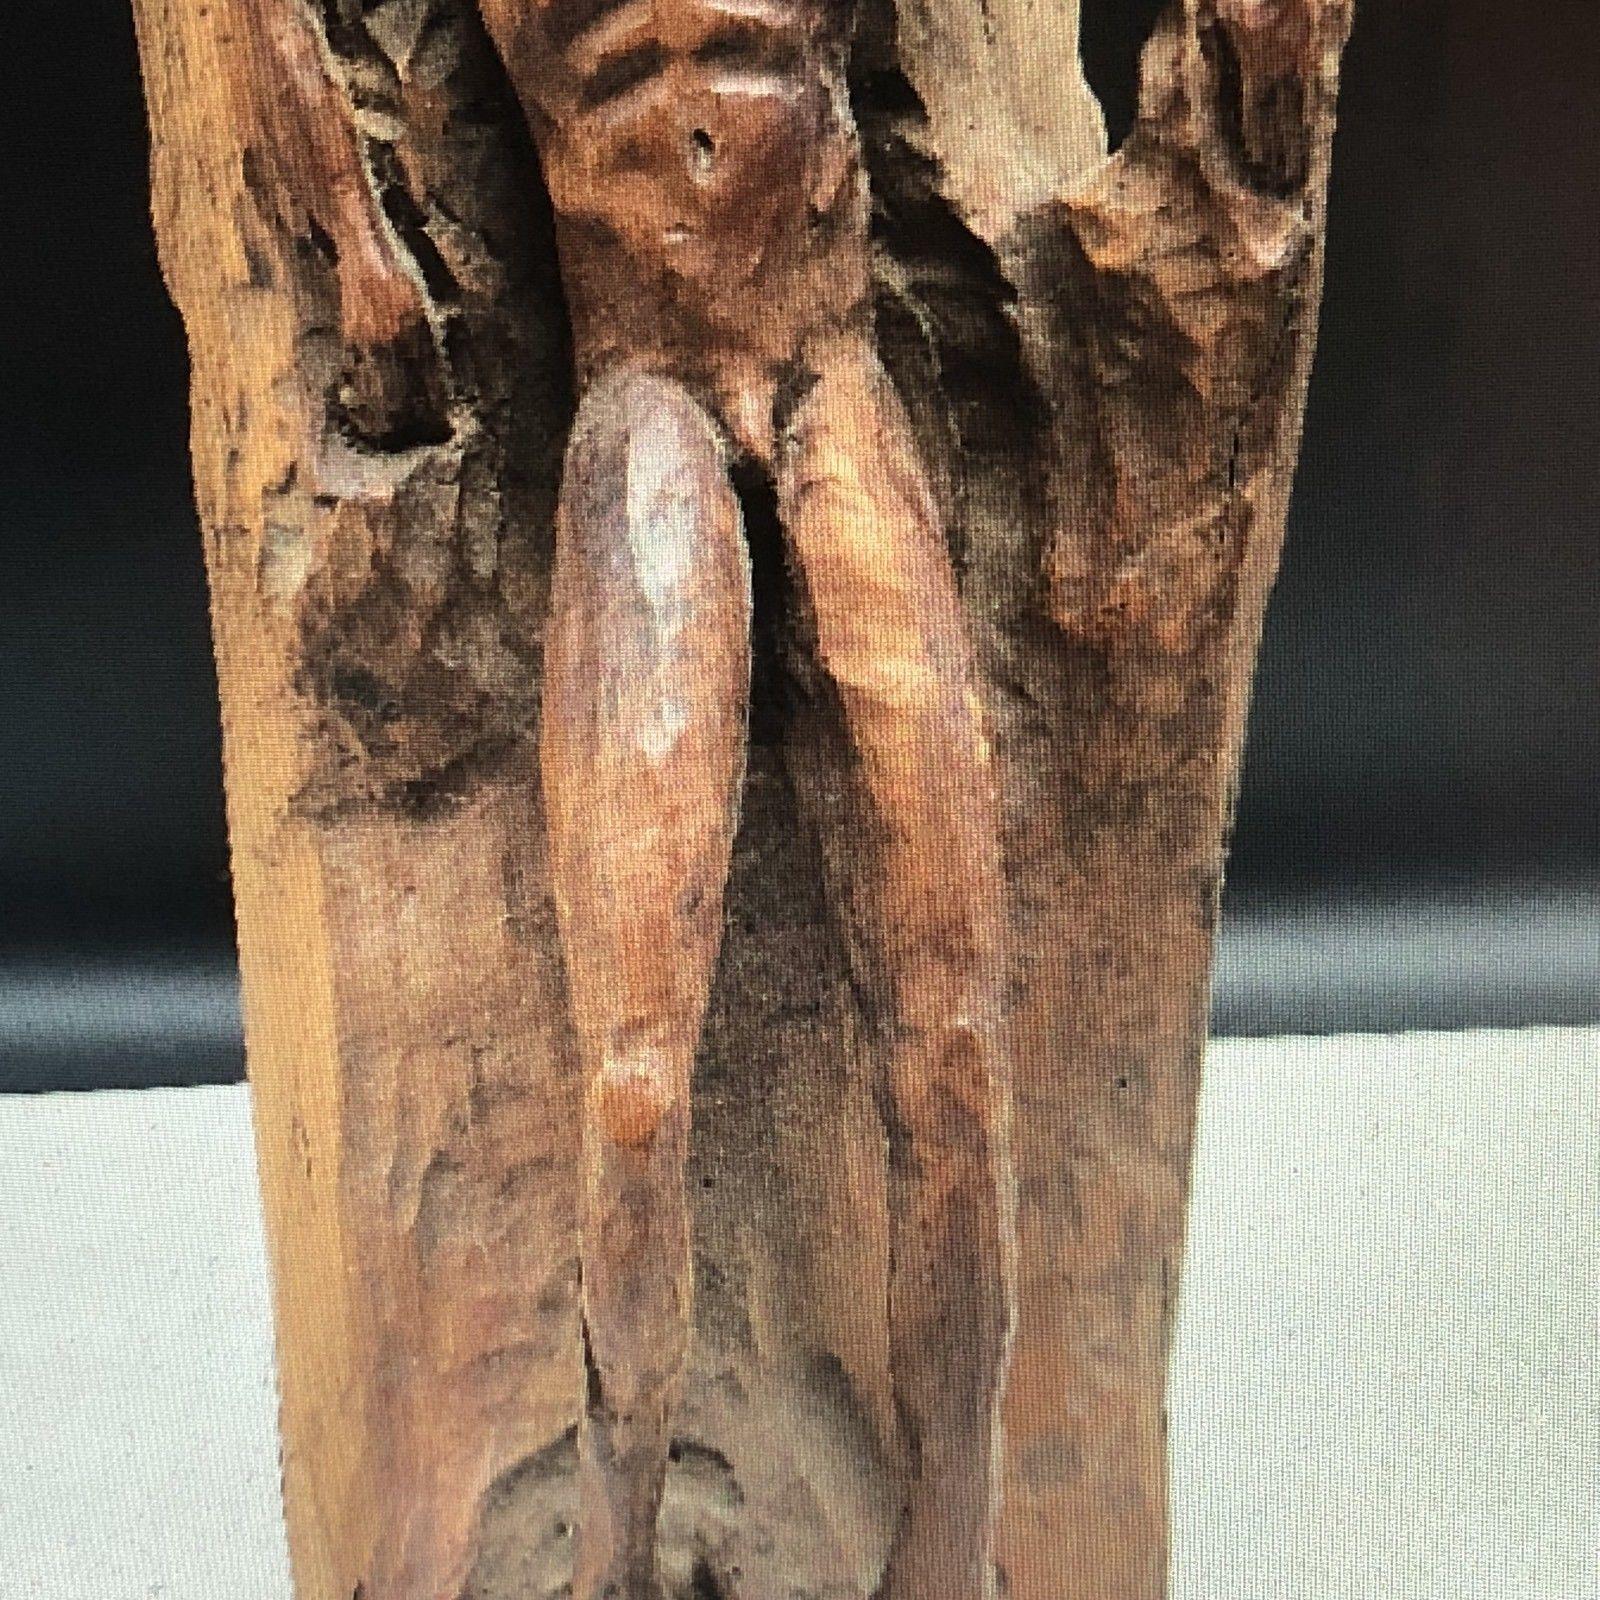 HAND CARVED WOOD NAKED MAN FOLK ART vintage antique nude male stand sculpture